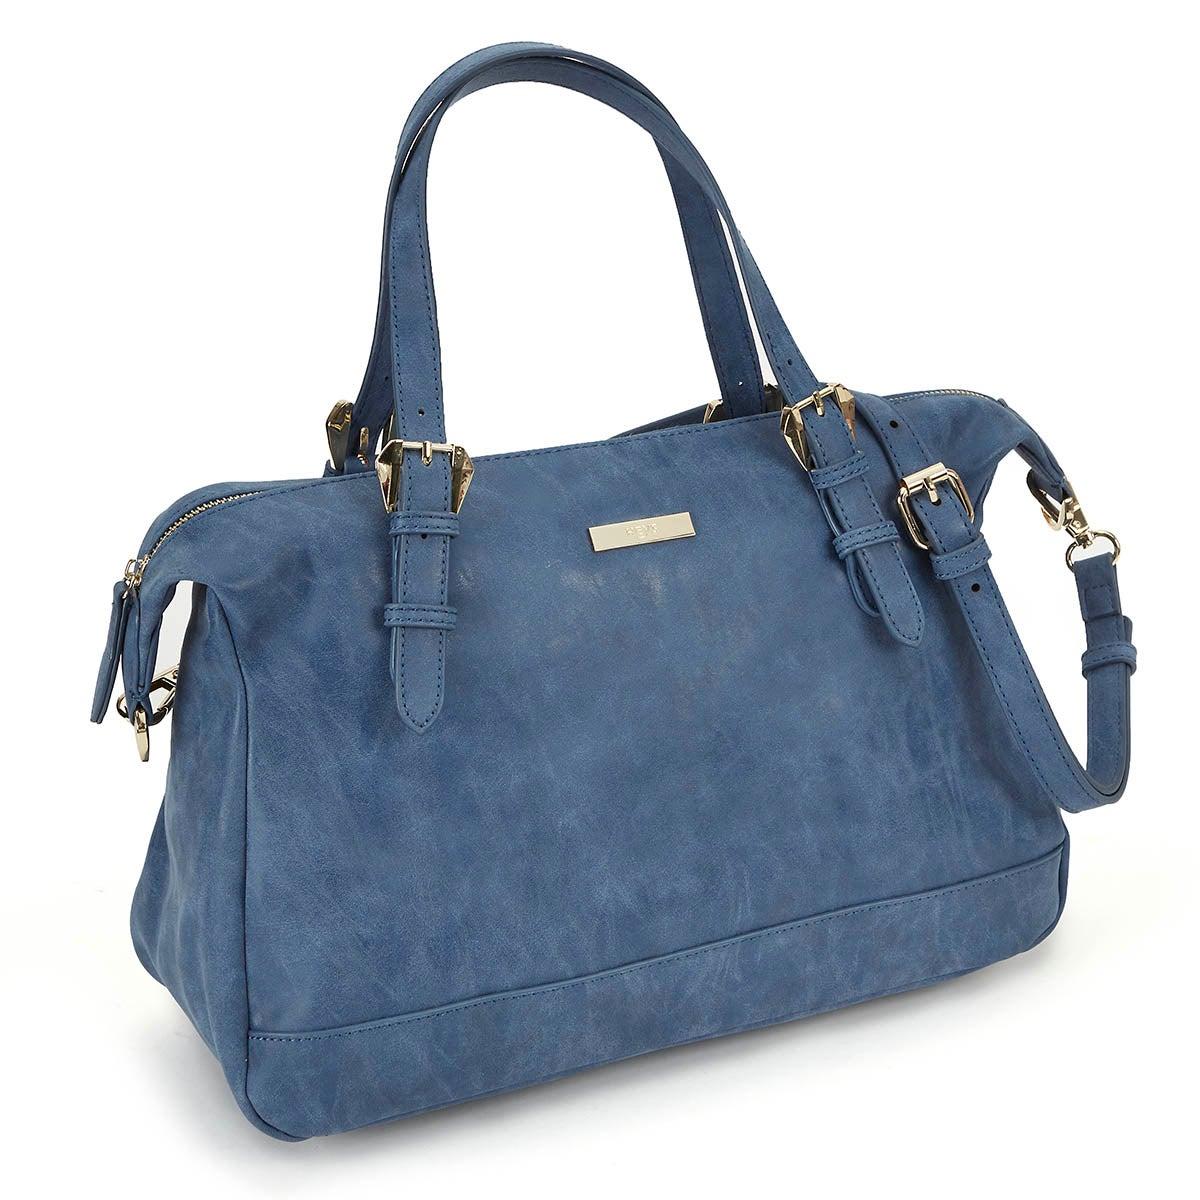 Lds Vintage denim blue satchel